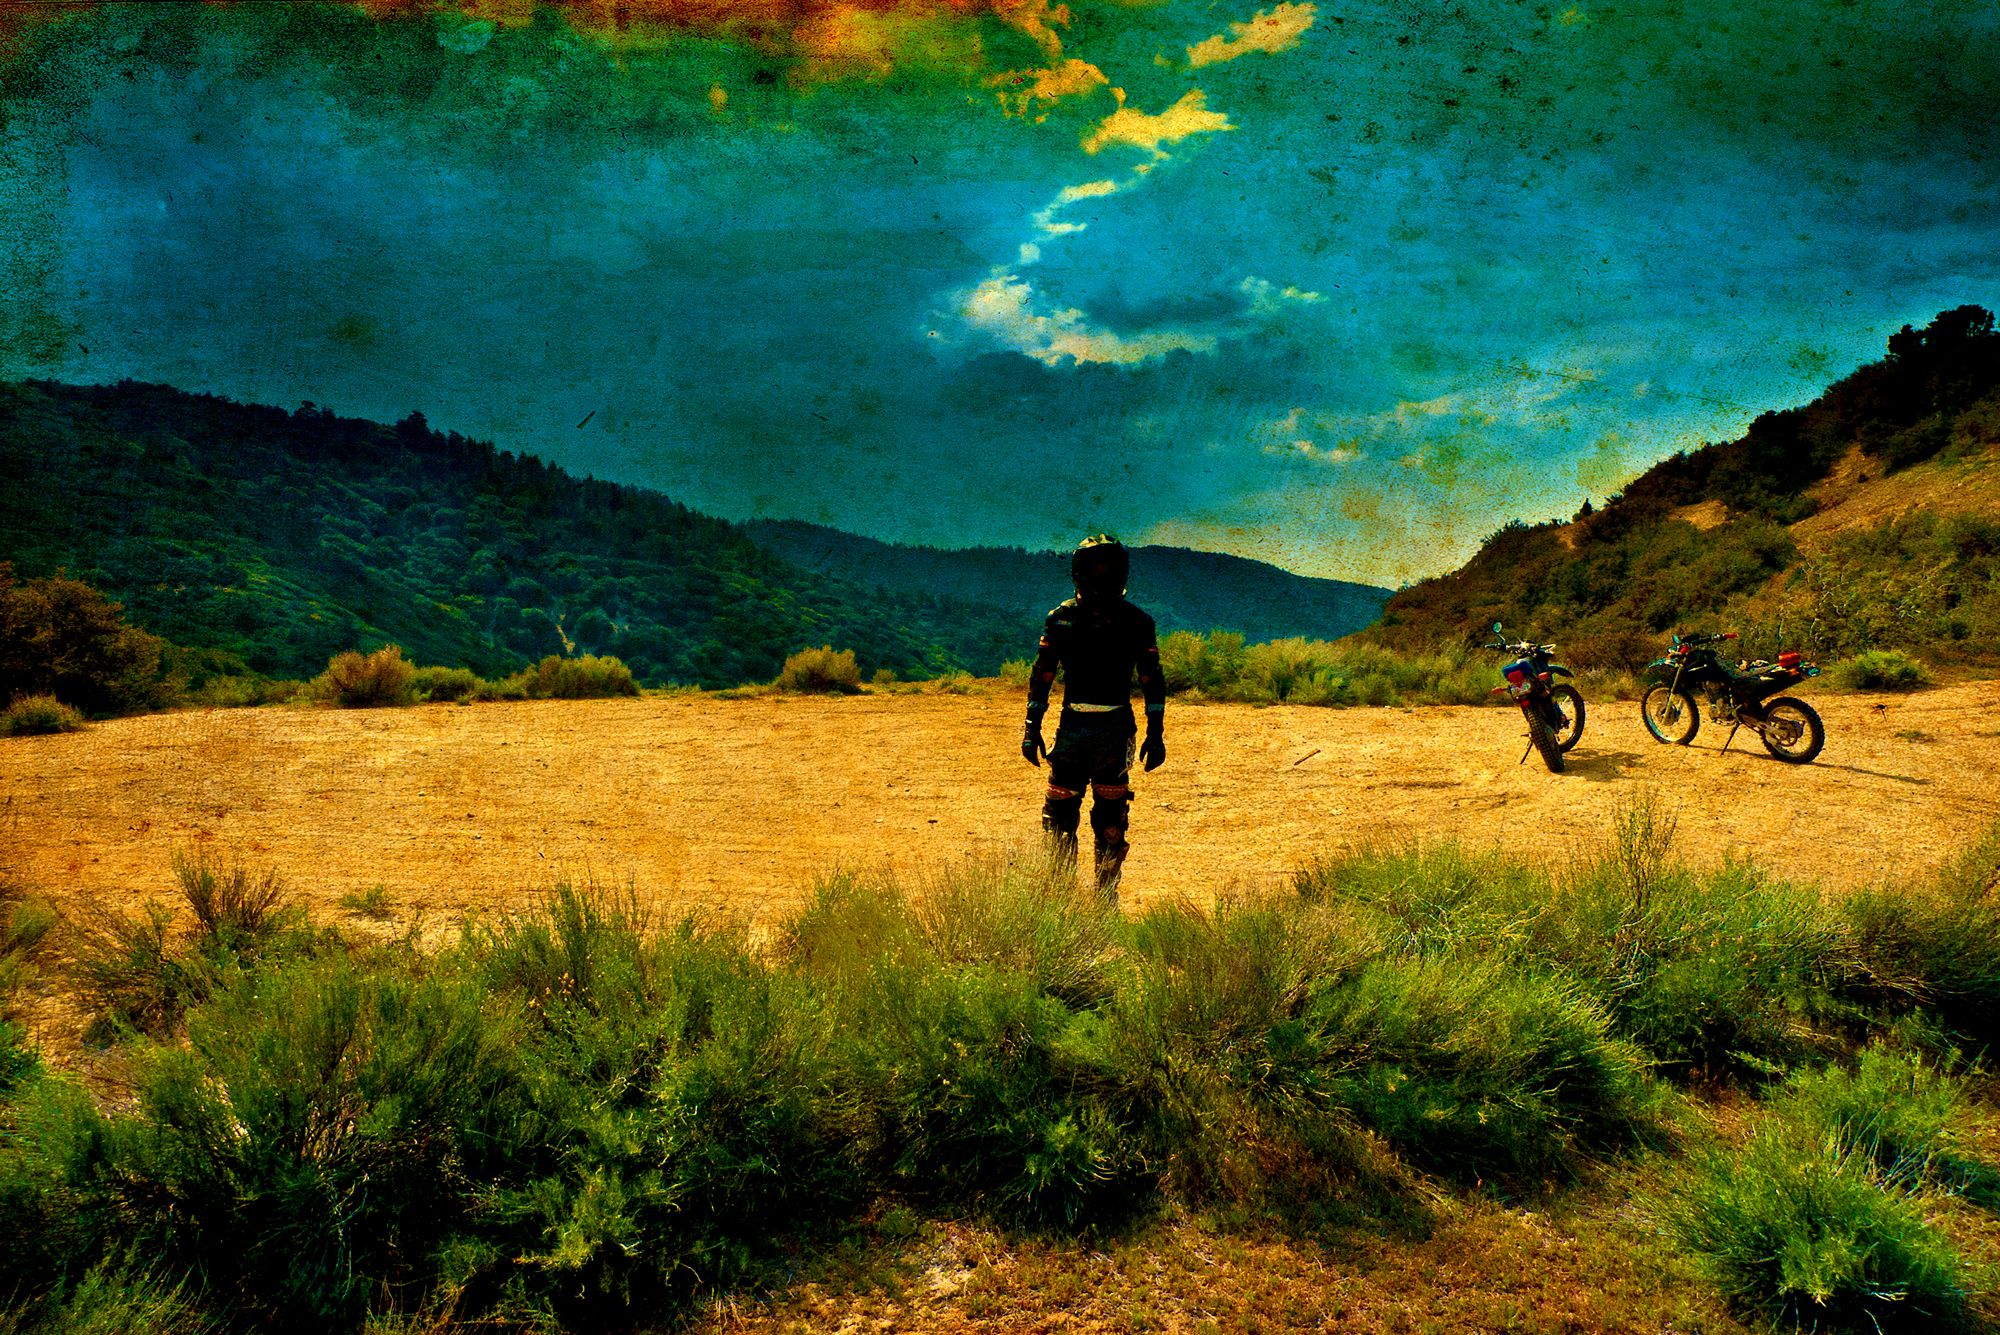 dirtbiking_la.jpg